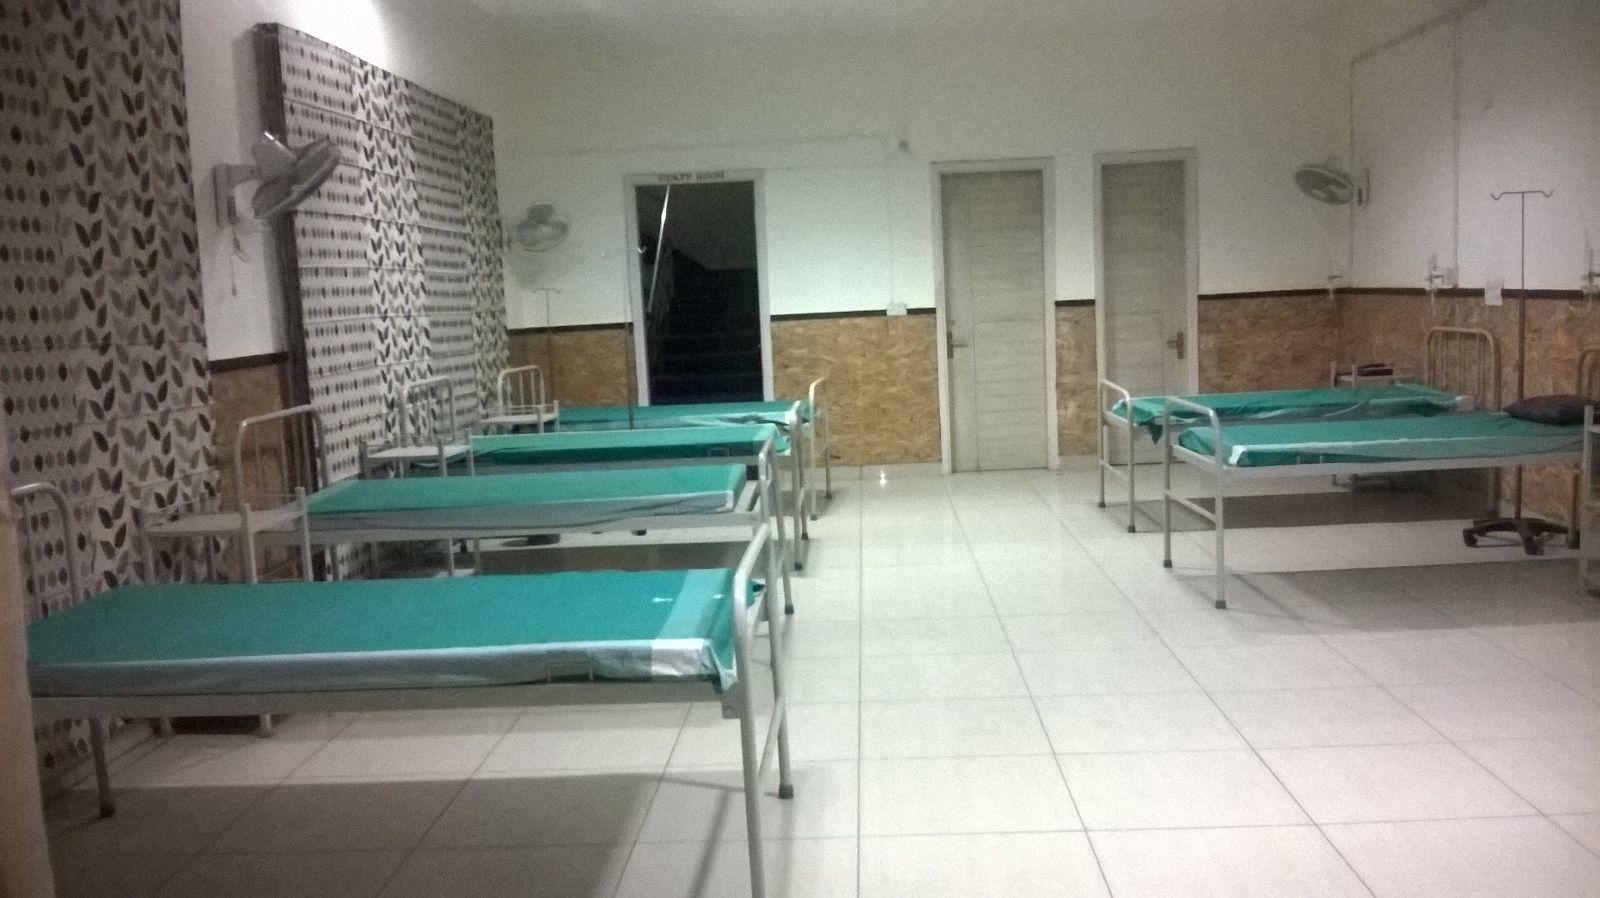 Profitable Running 50 Bedded Hospital for Lease in Haryana